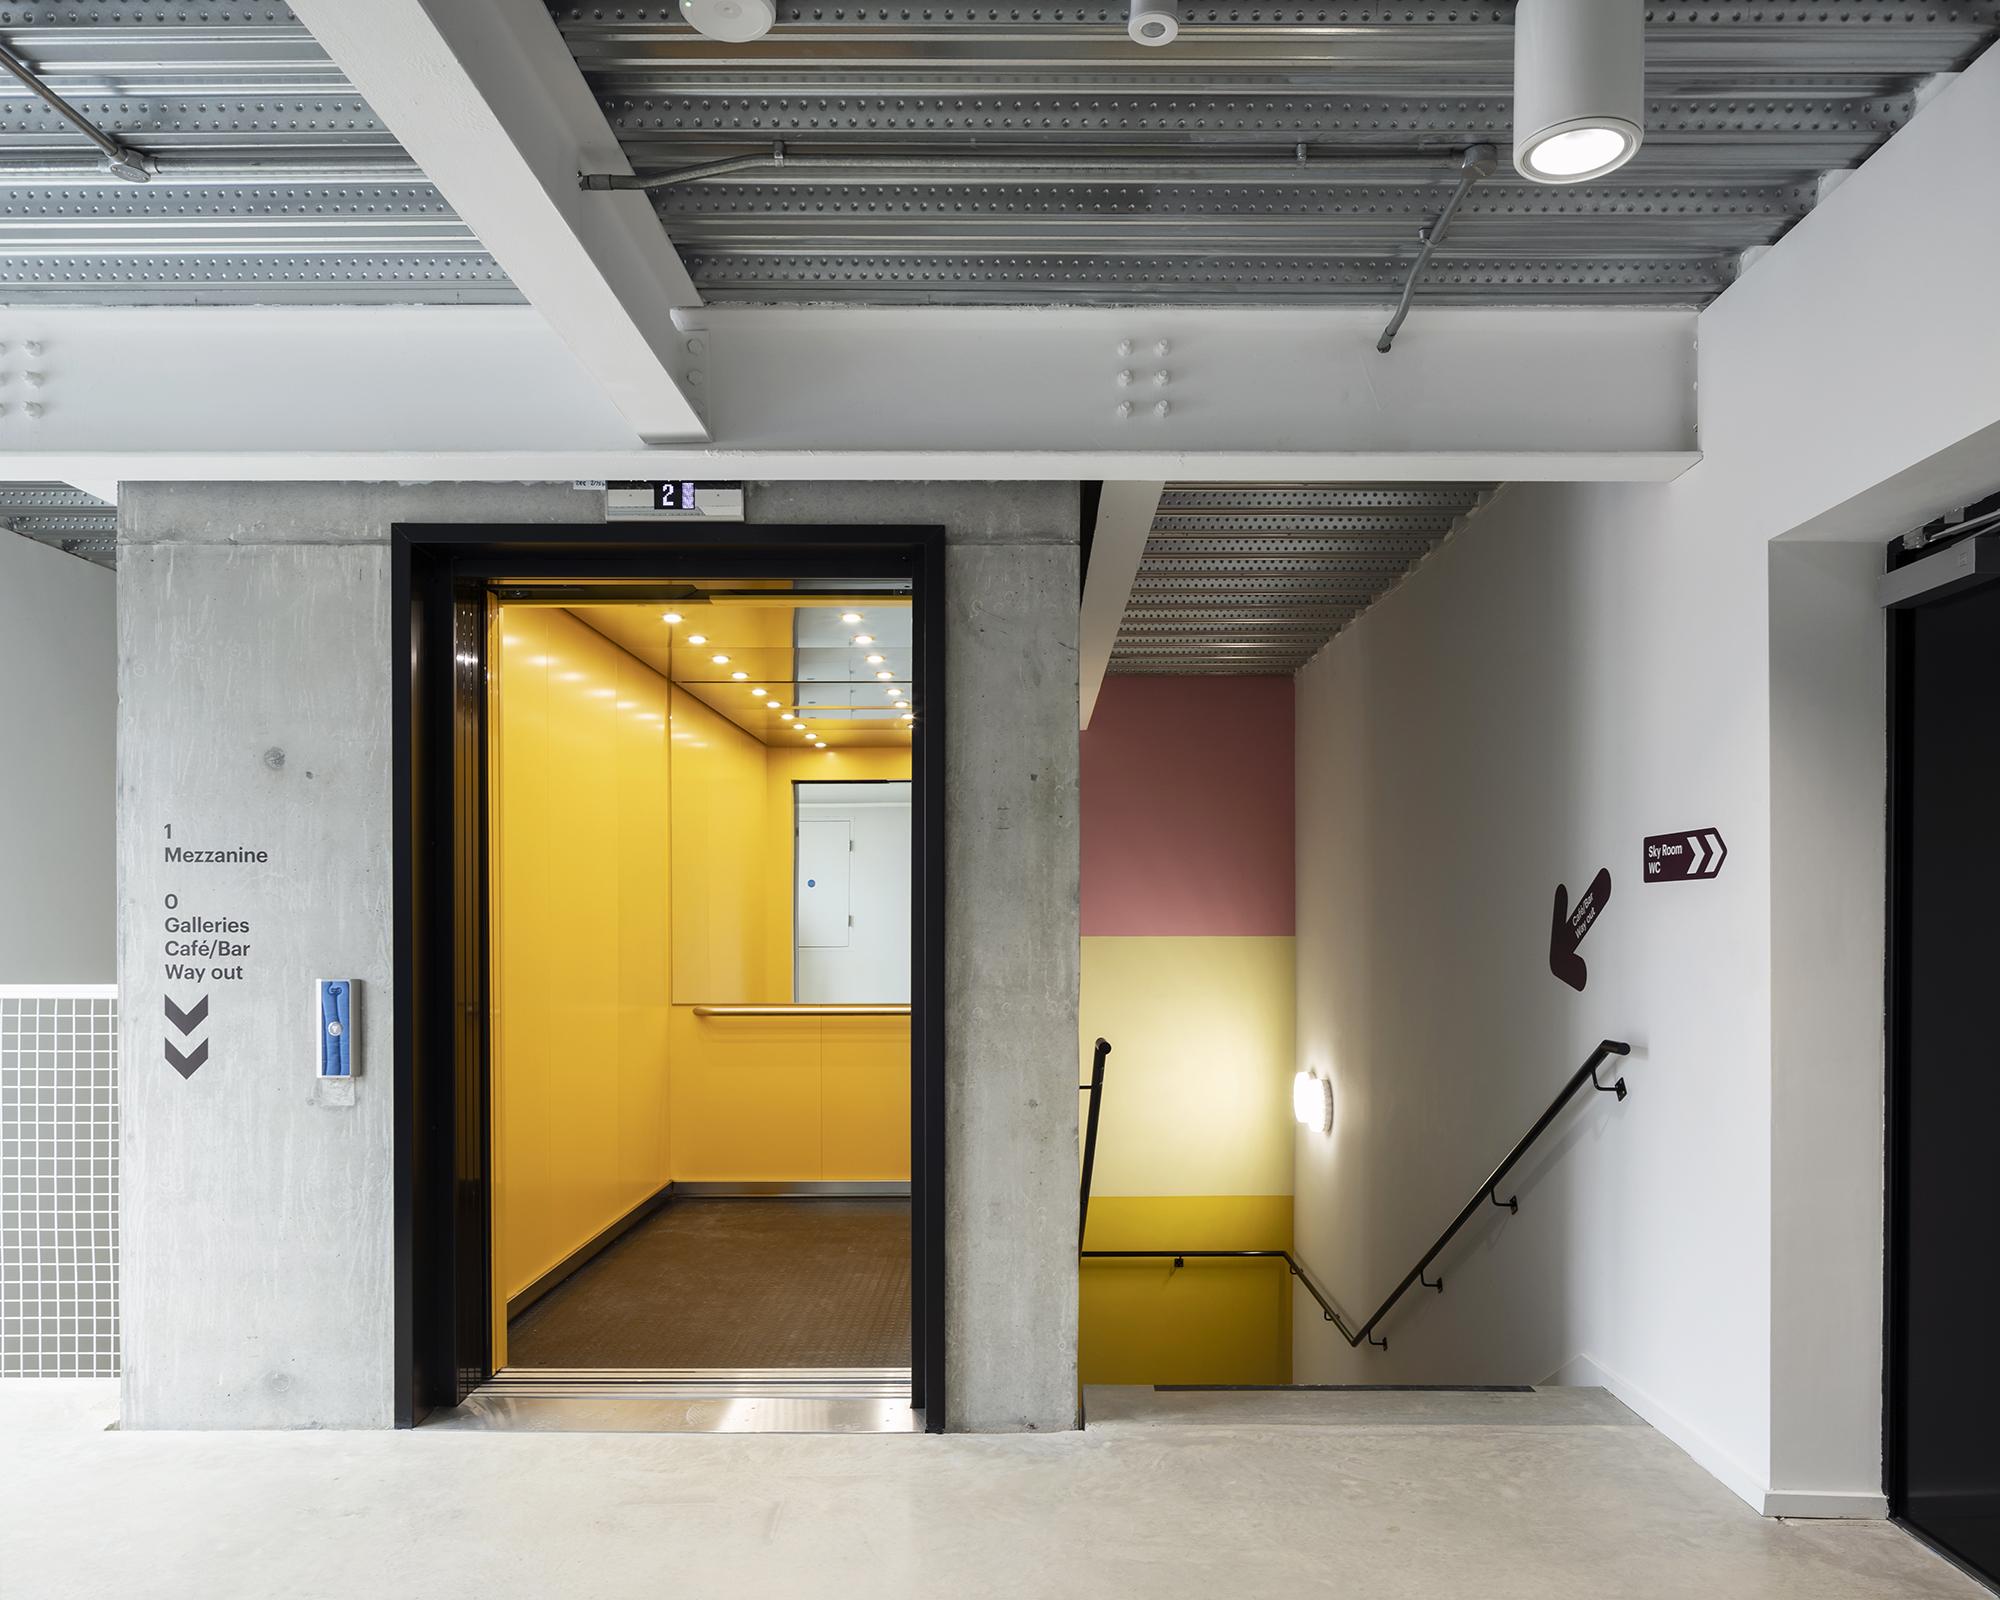 41_MK-Gallery-photo-Johan Dehlin.jpg